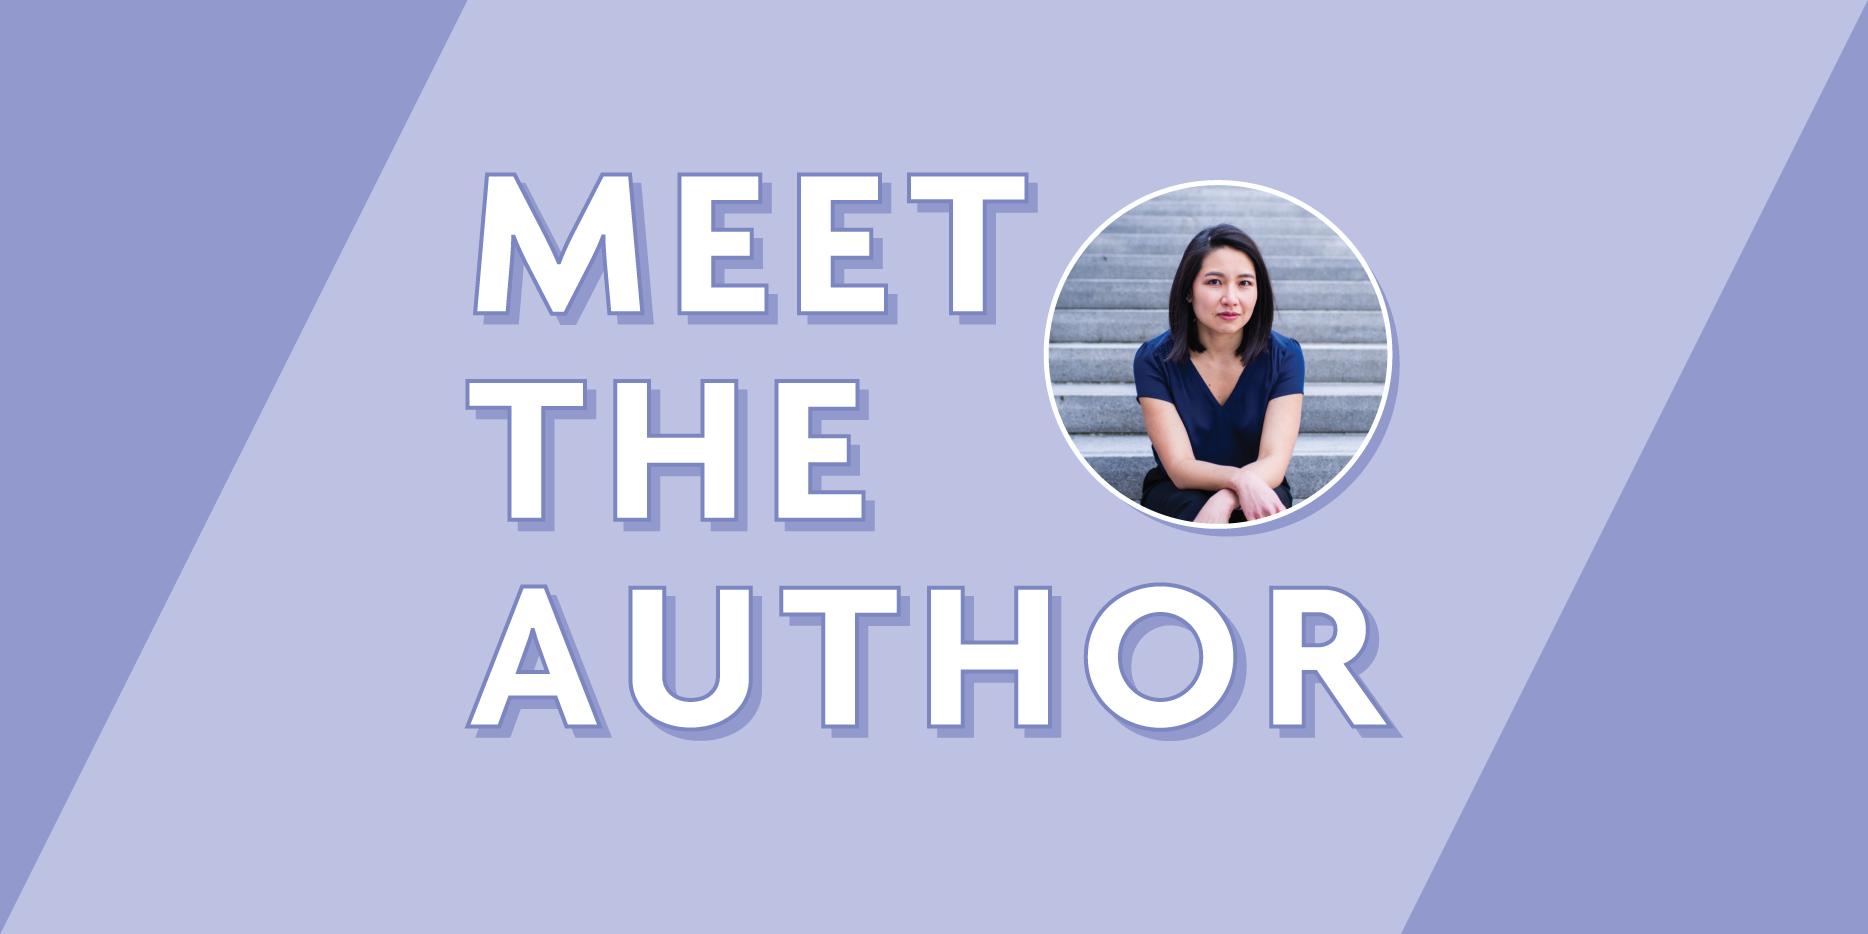 Meet the author: Kirstin Chen